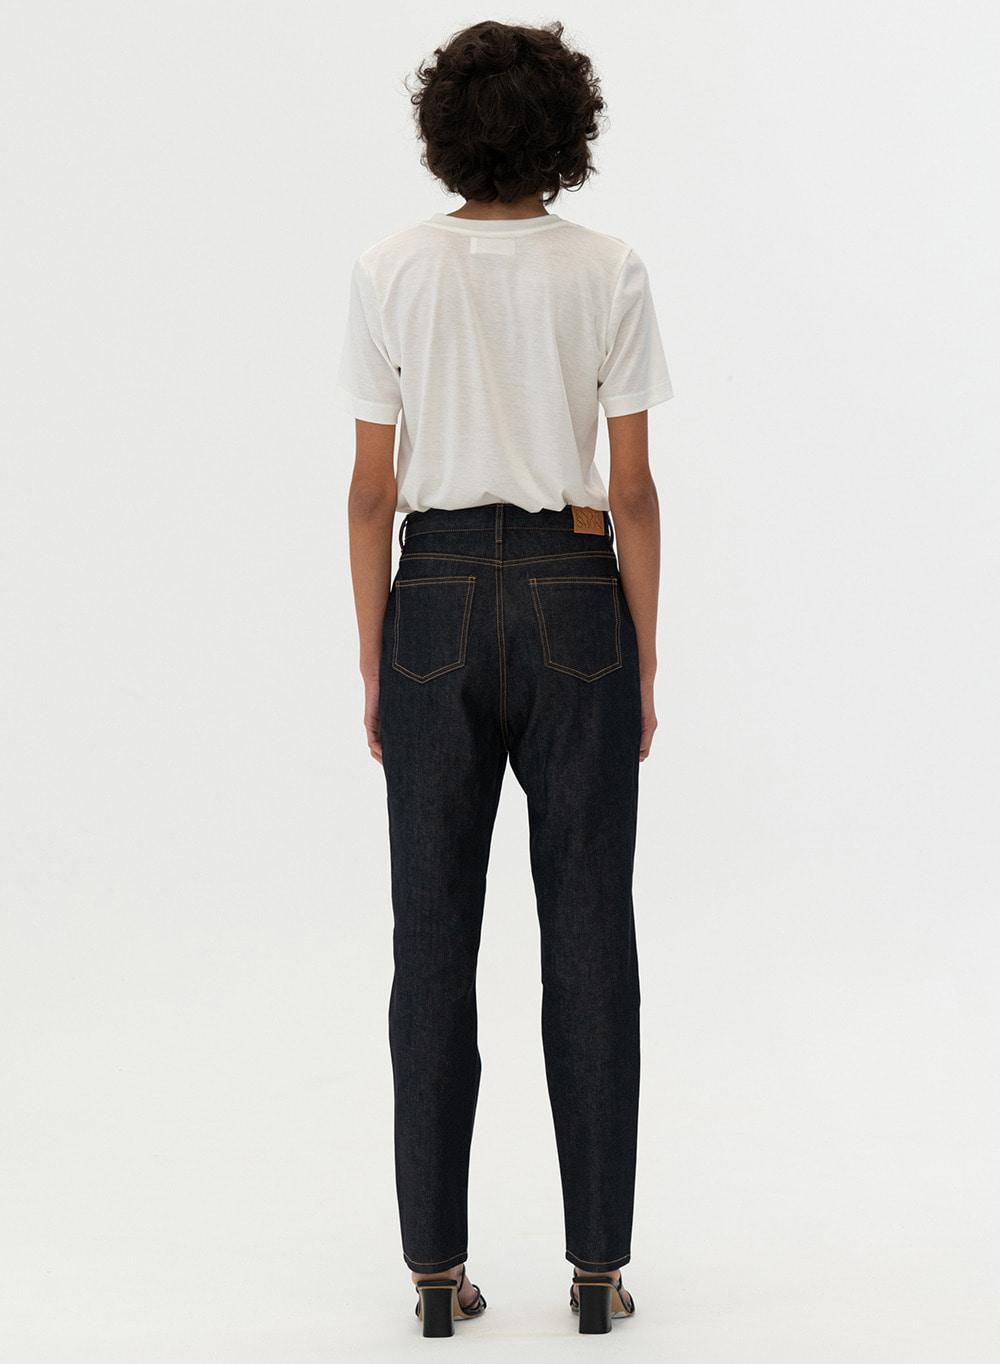 [ESSENTIAL] Triple Stitch Jeans Selvedge